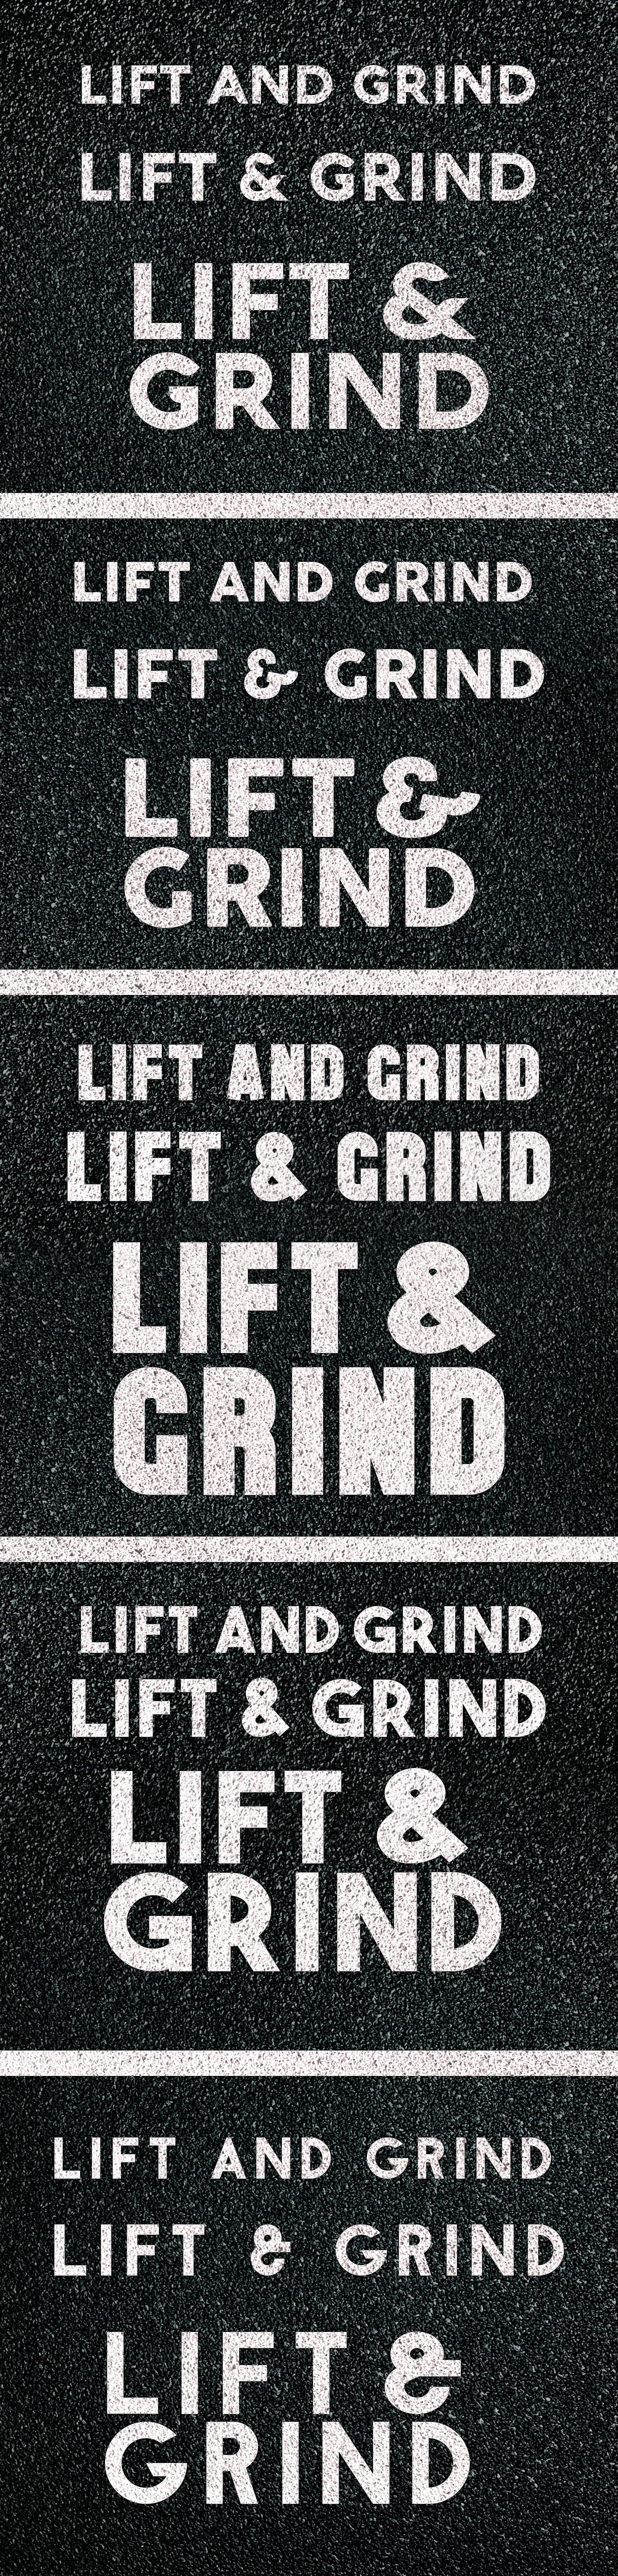 Lift & Grind Tee